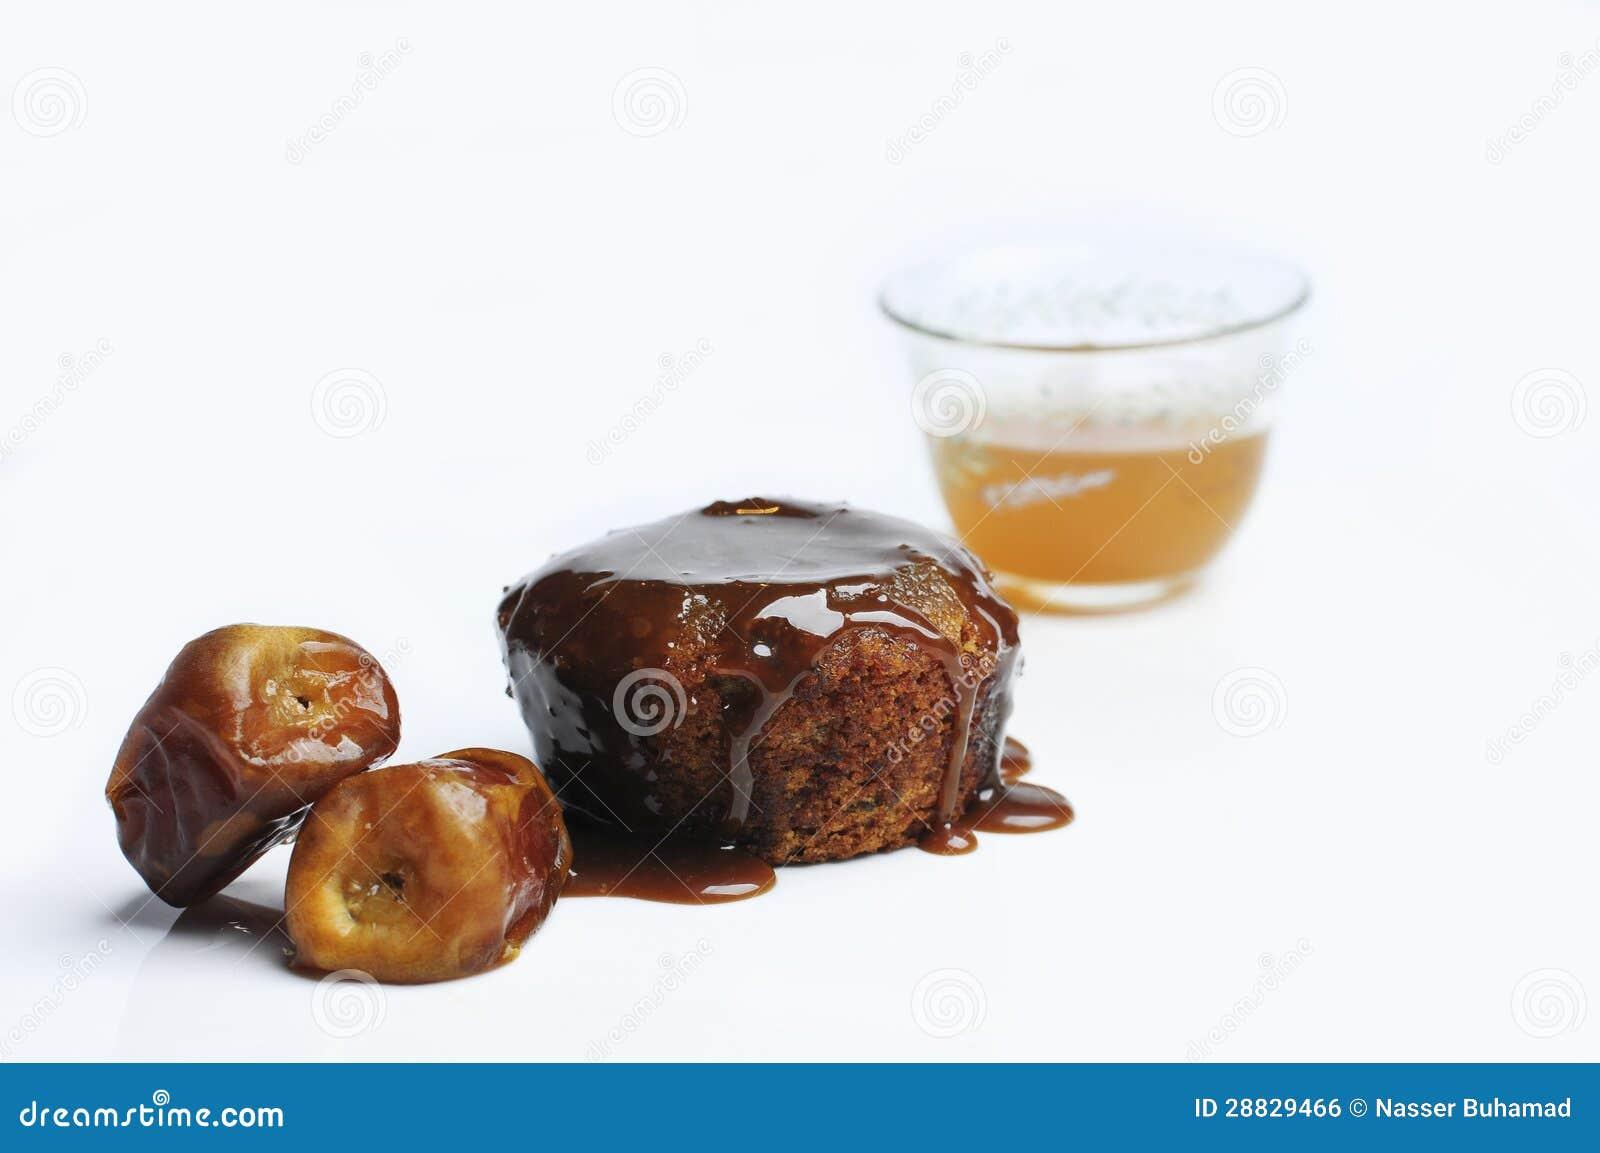 Chocolate Cake For Arabic Coffee Stock Photo - Image of